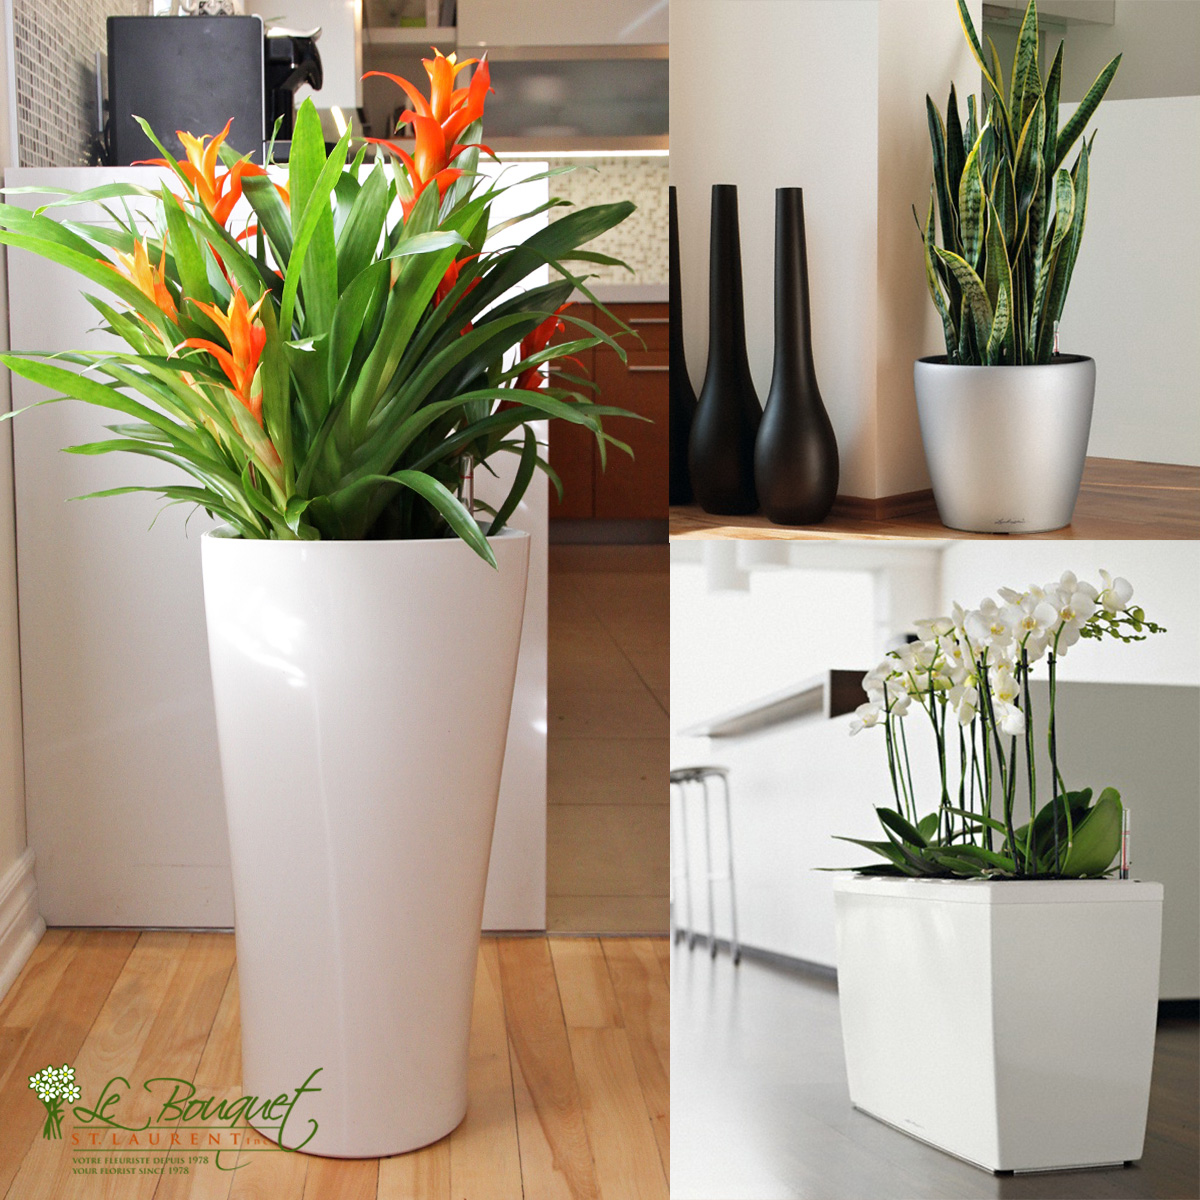 Lechuza brand self-watering pots sold by Montreal florist Le Bouquet St Laurent